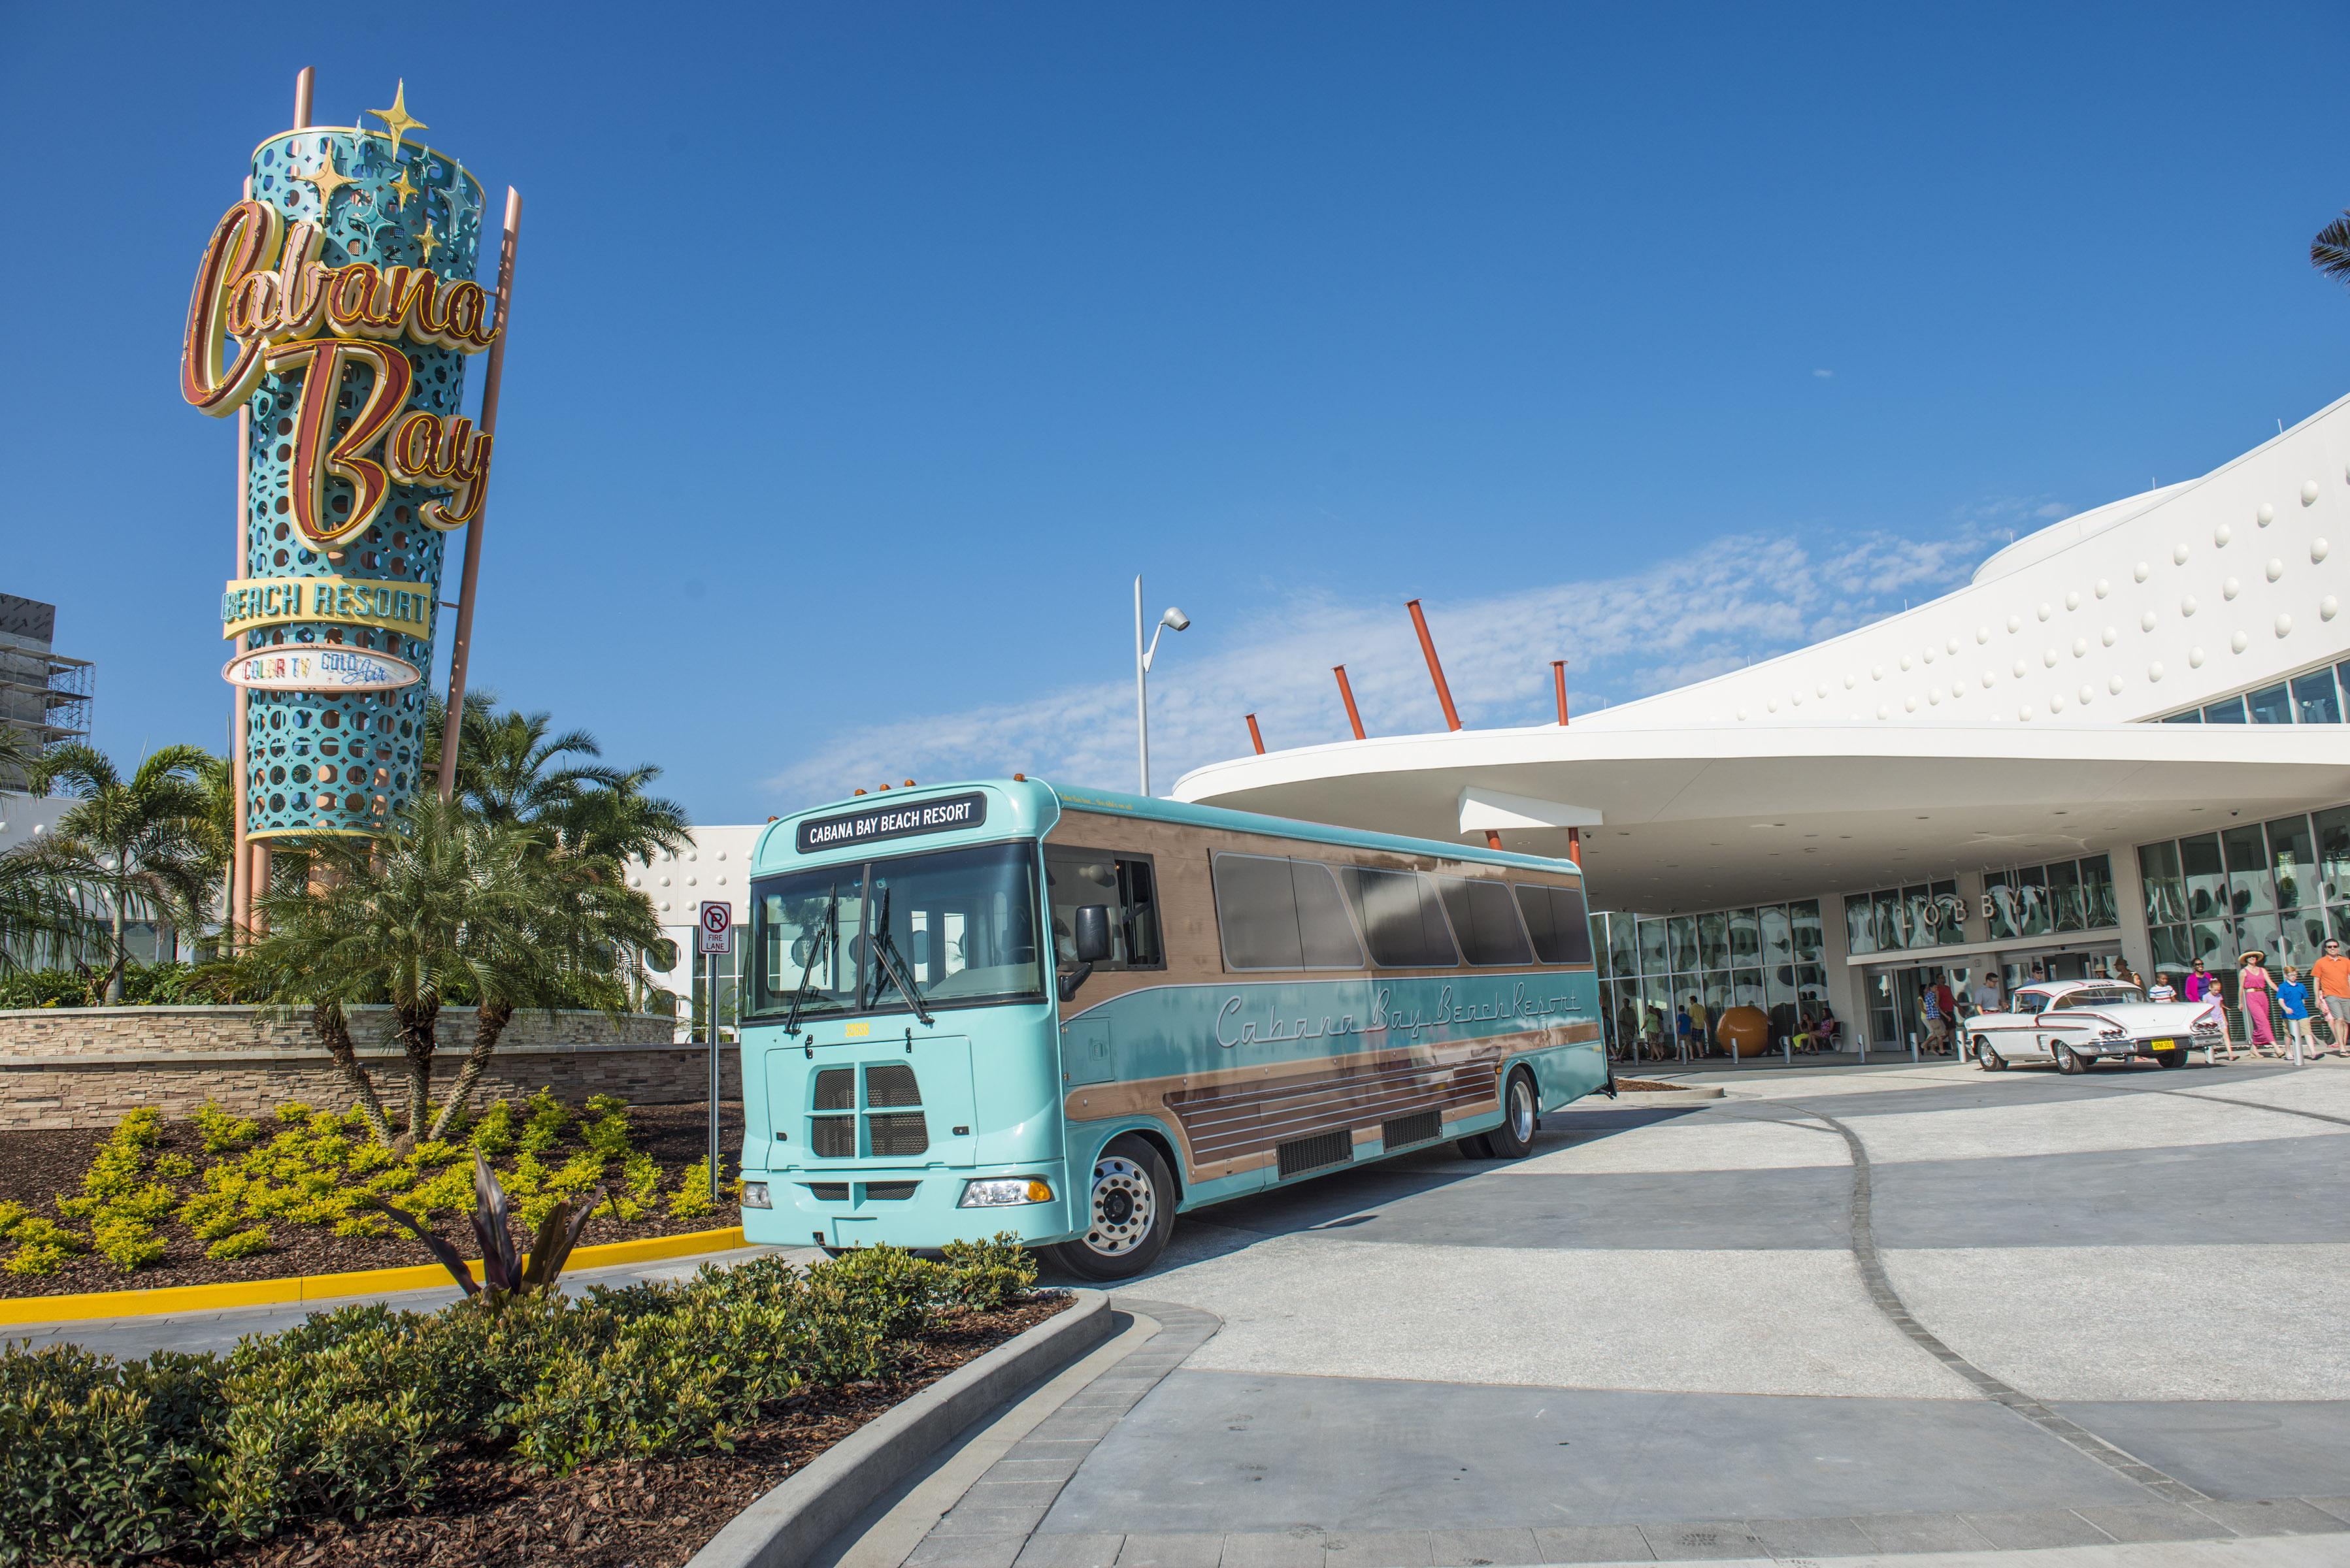 Universal S Cabana Bay Beach Resort Is Now Open Mom Luck